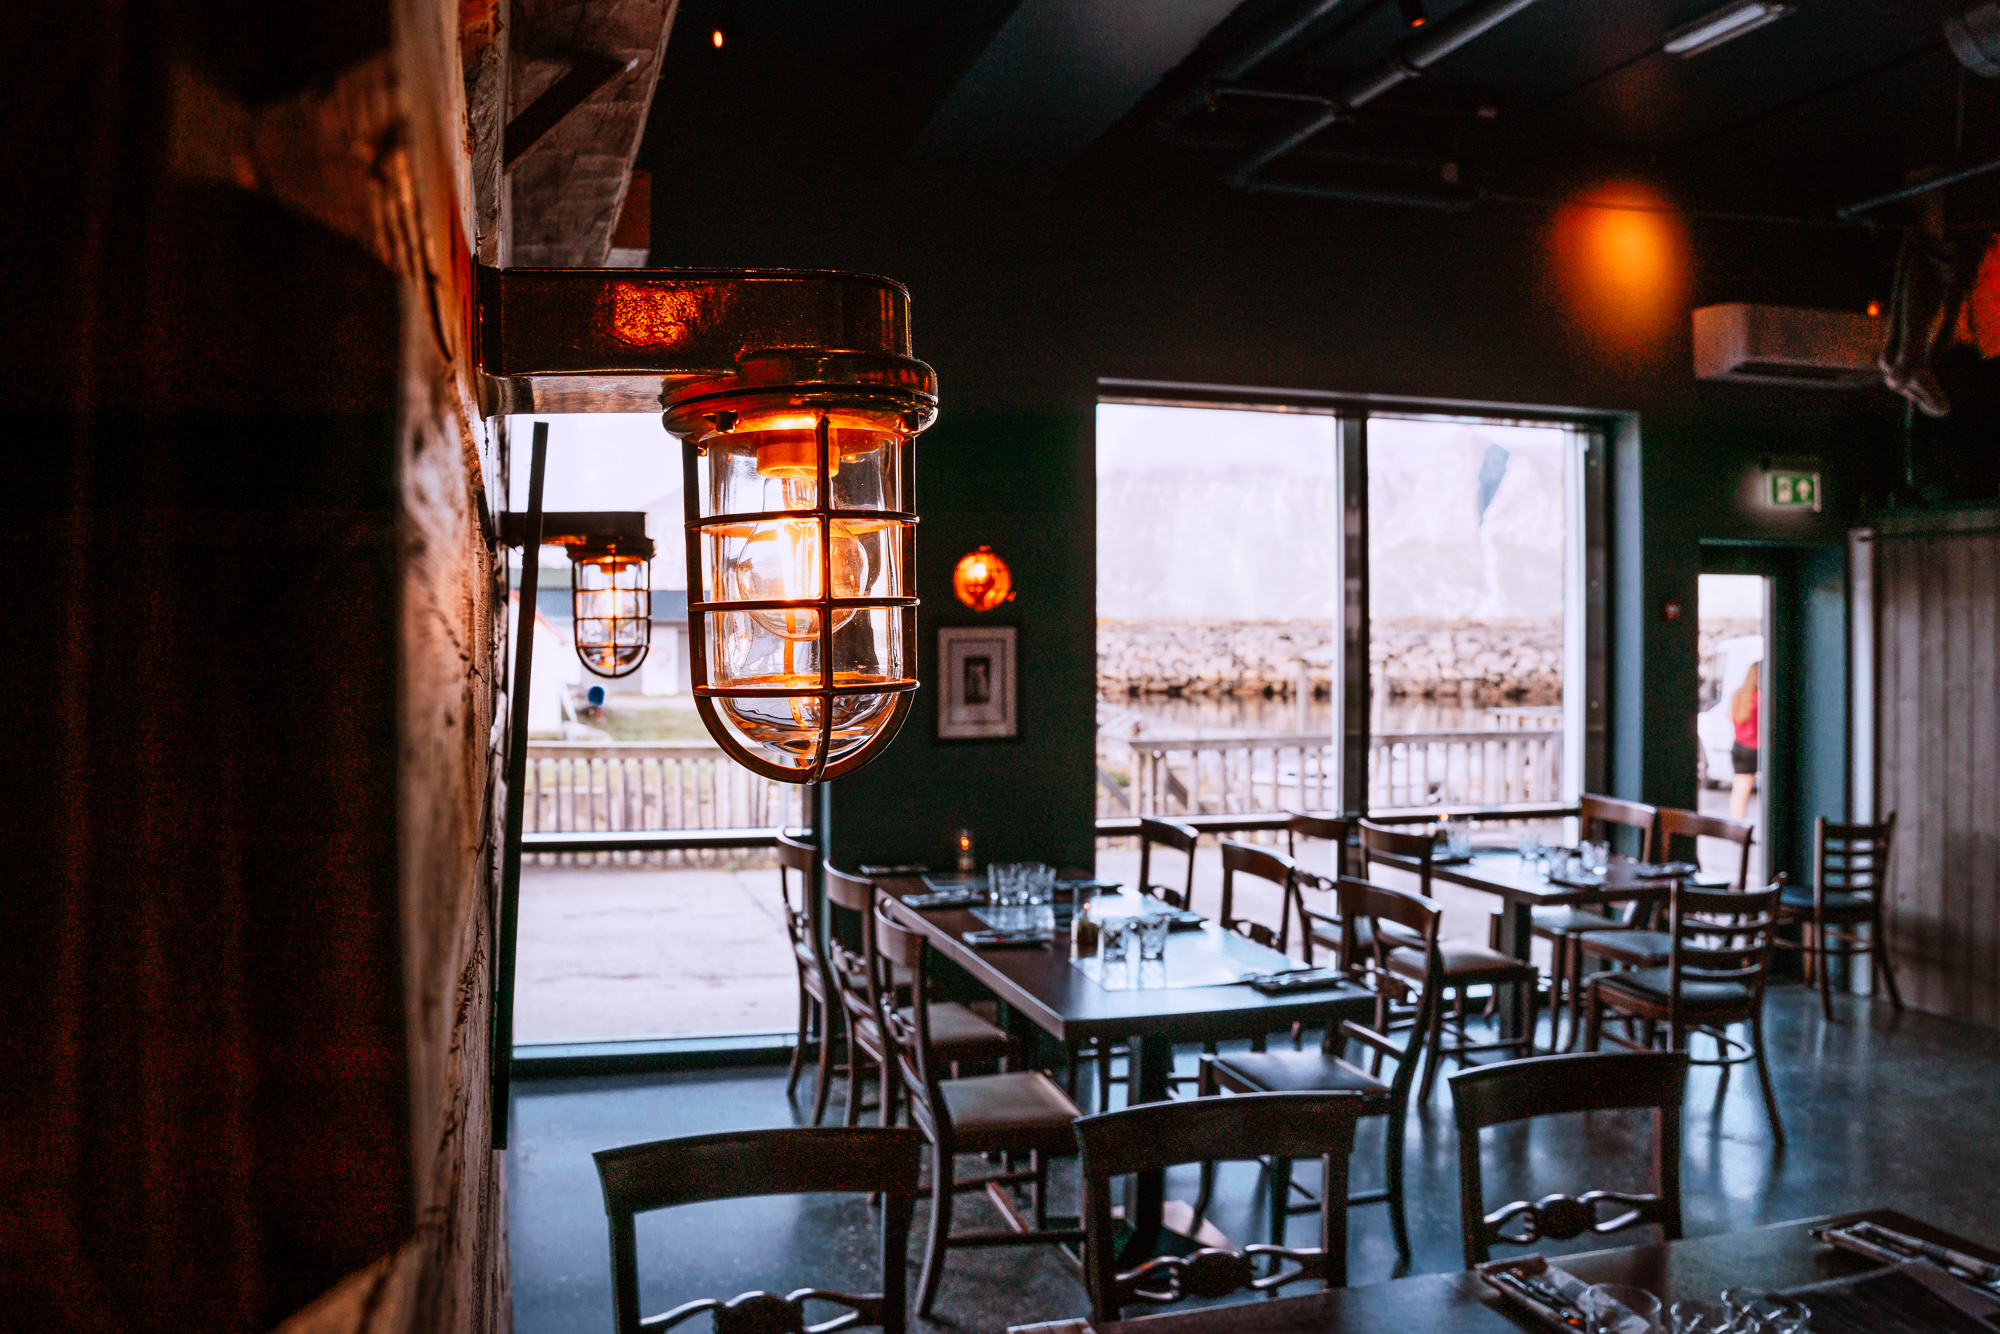 Salteriet restaurant by Mefjord Brygge-6